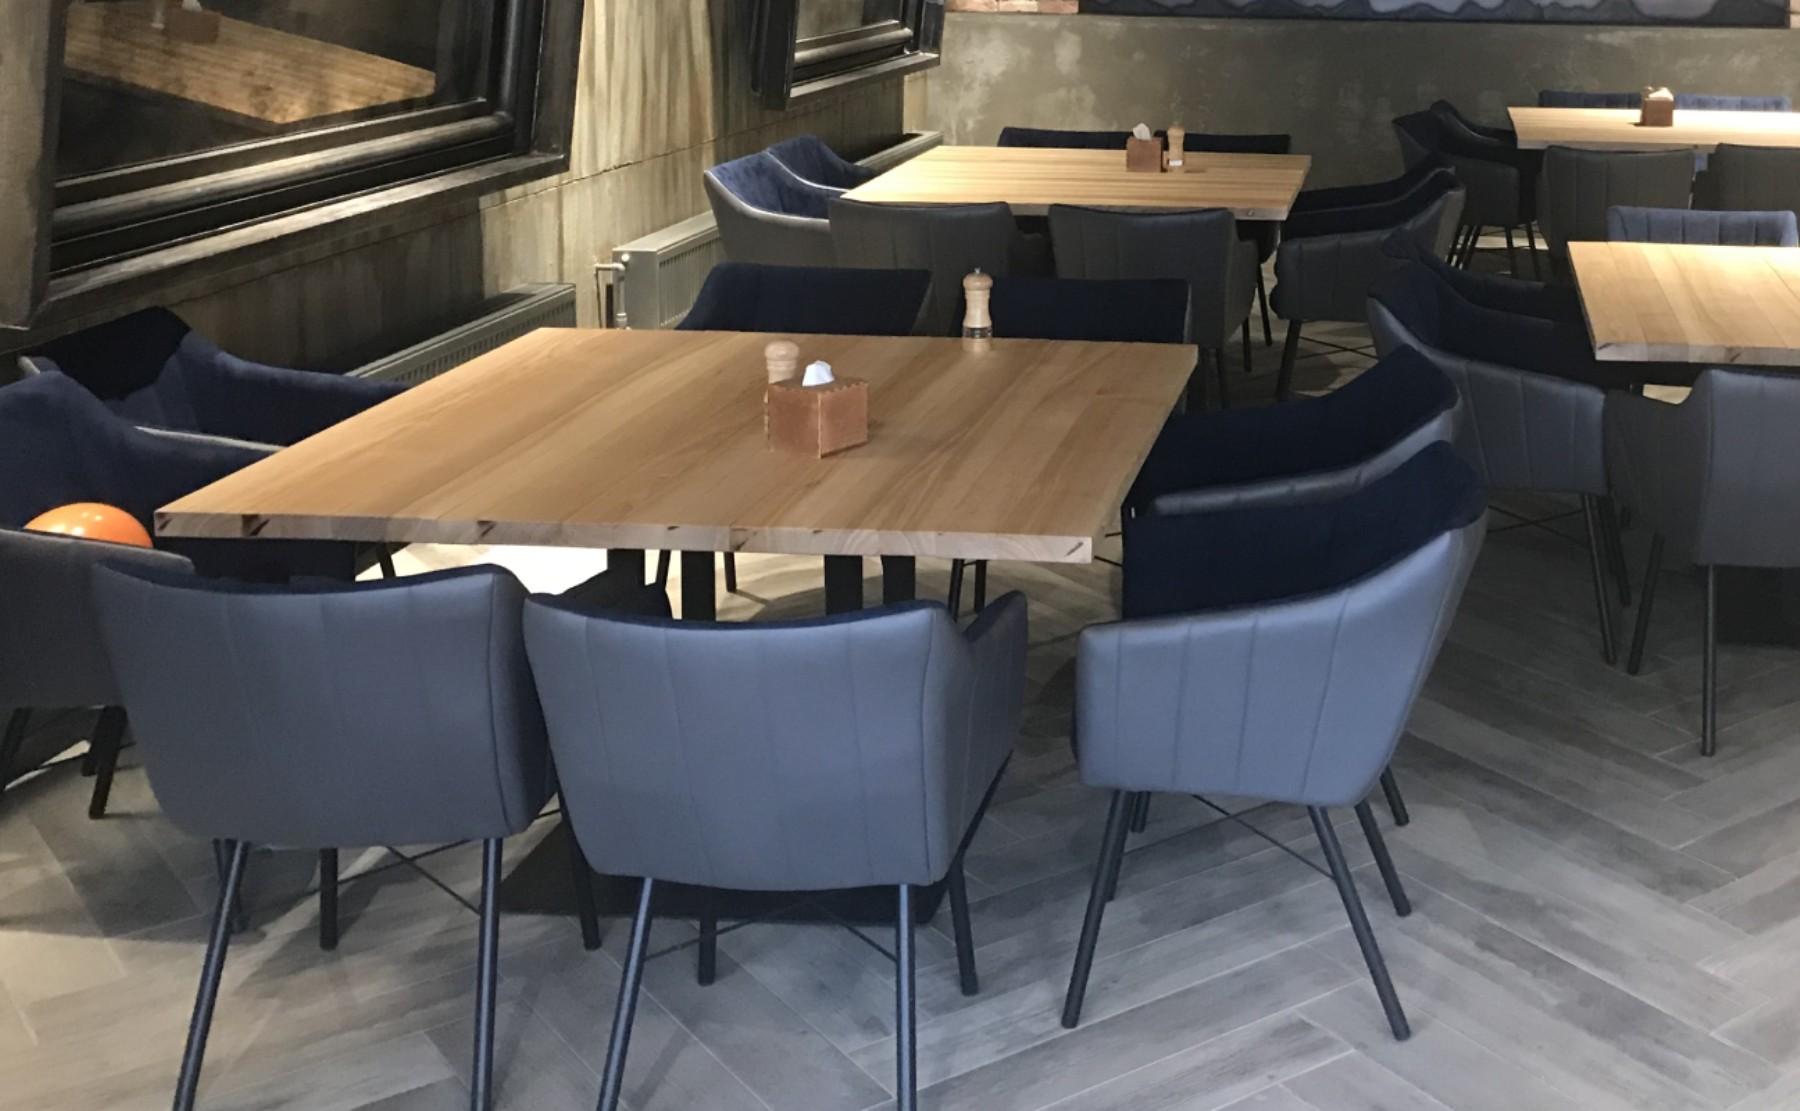 furniture-for-cafe-1